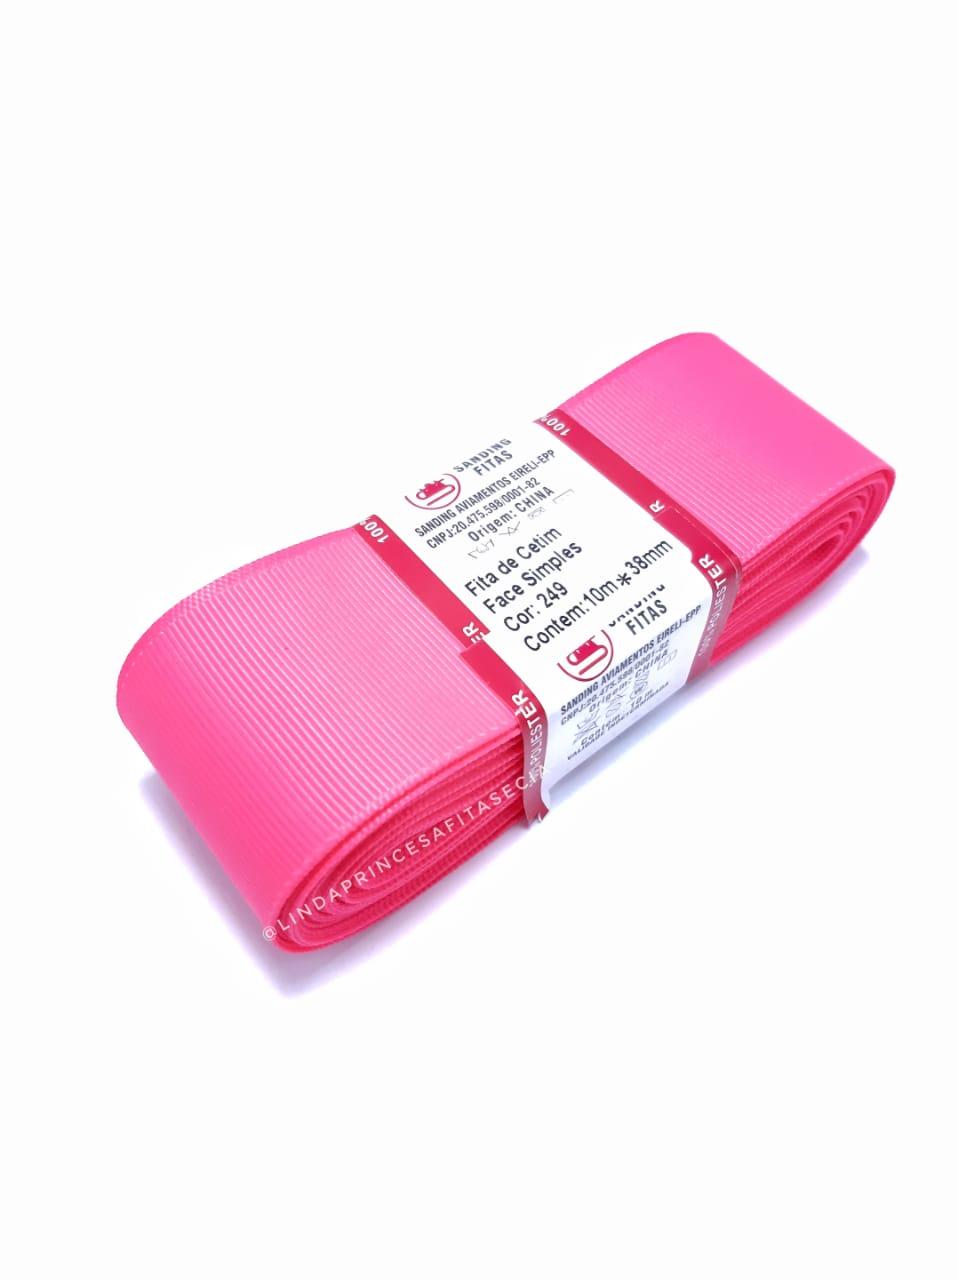 FITA SANDING 38 mm - Cor: 249 Rosa Neon.